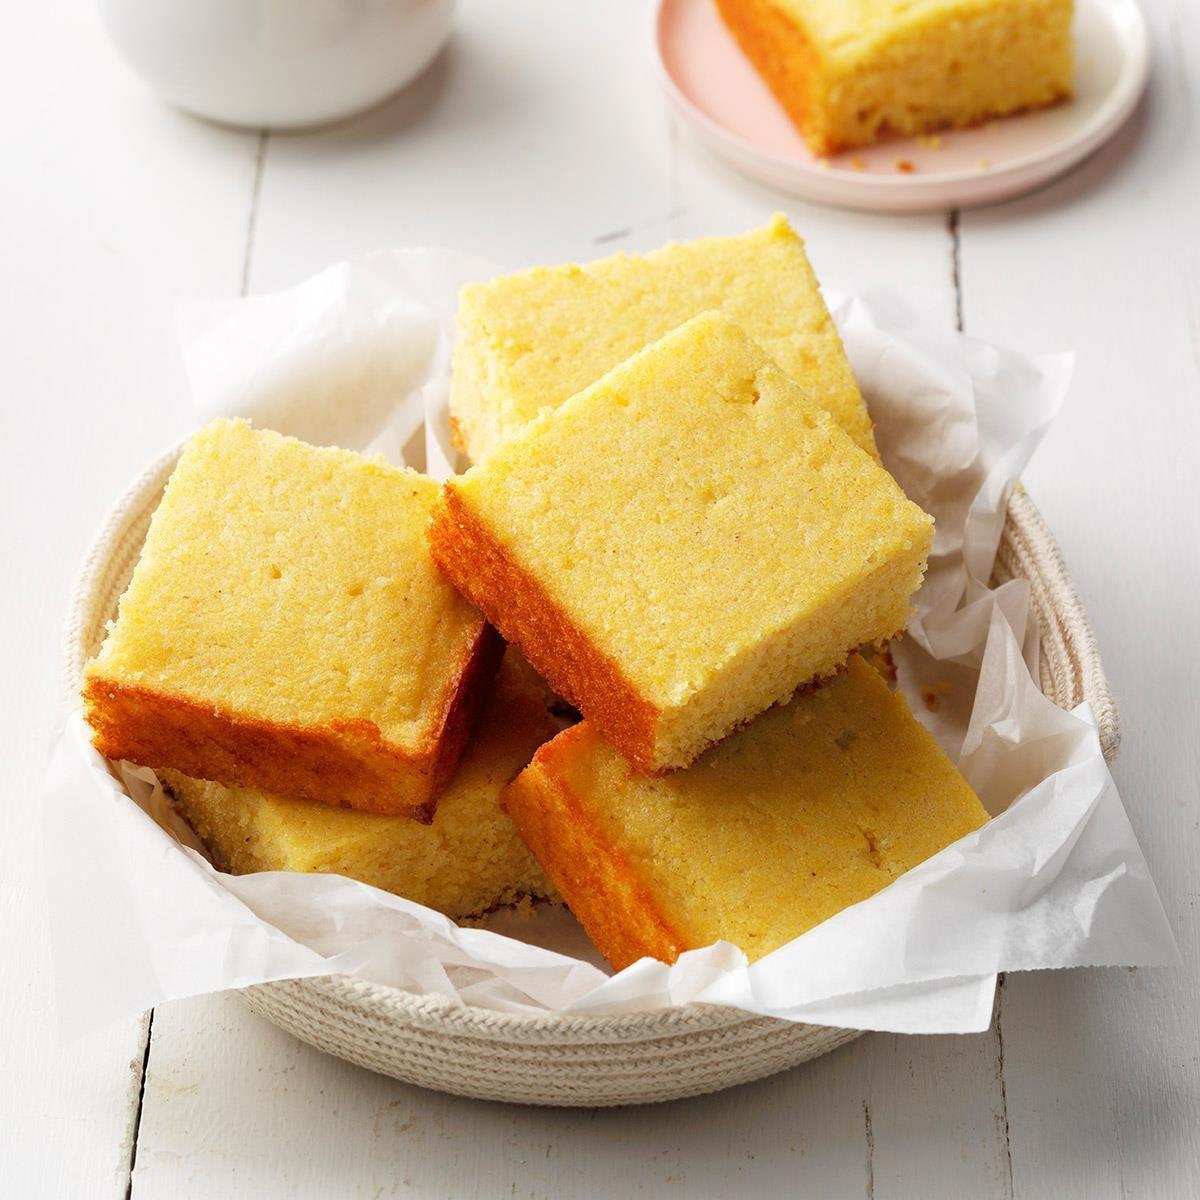 Buttery Corn Bread Exps Ghbz18 14600 E08 09 2b 2 168